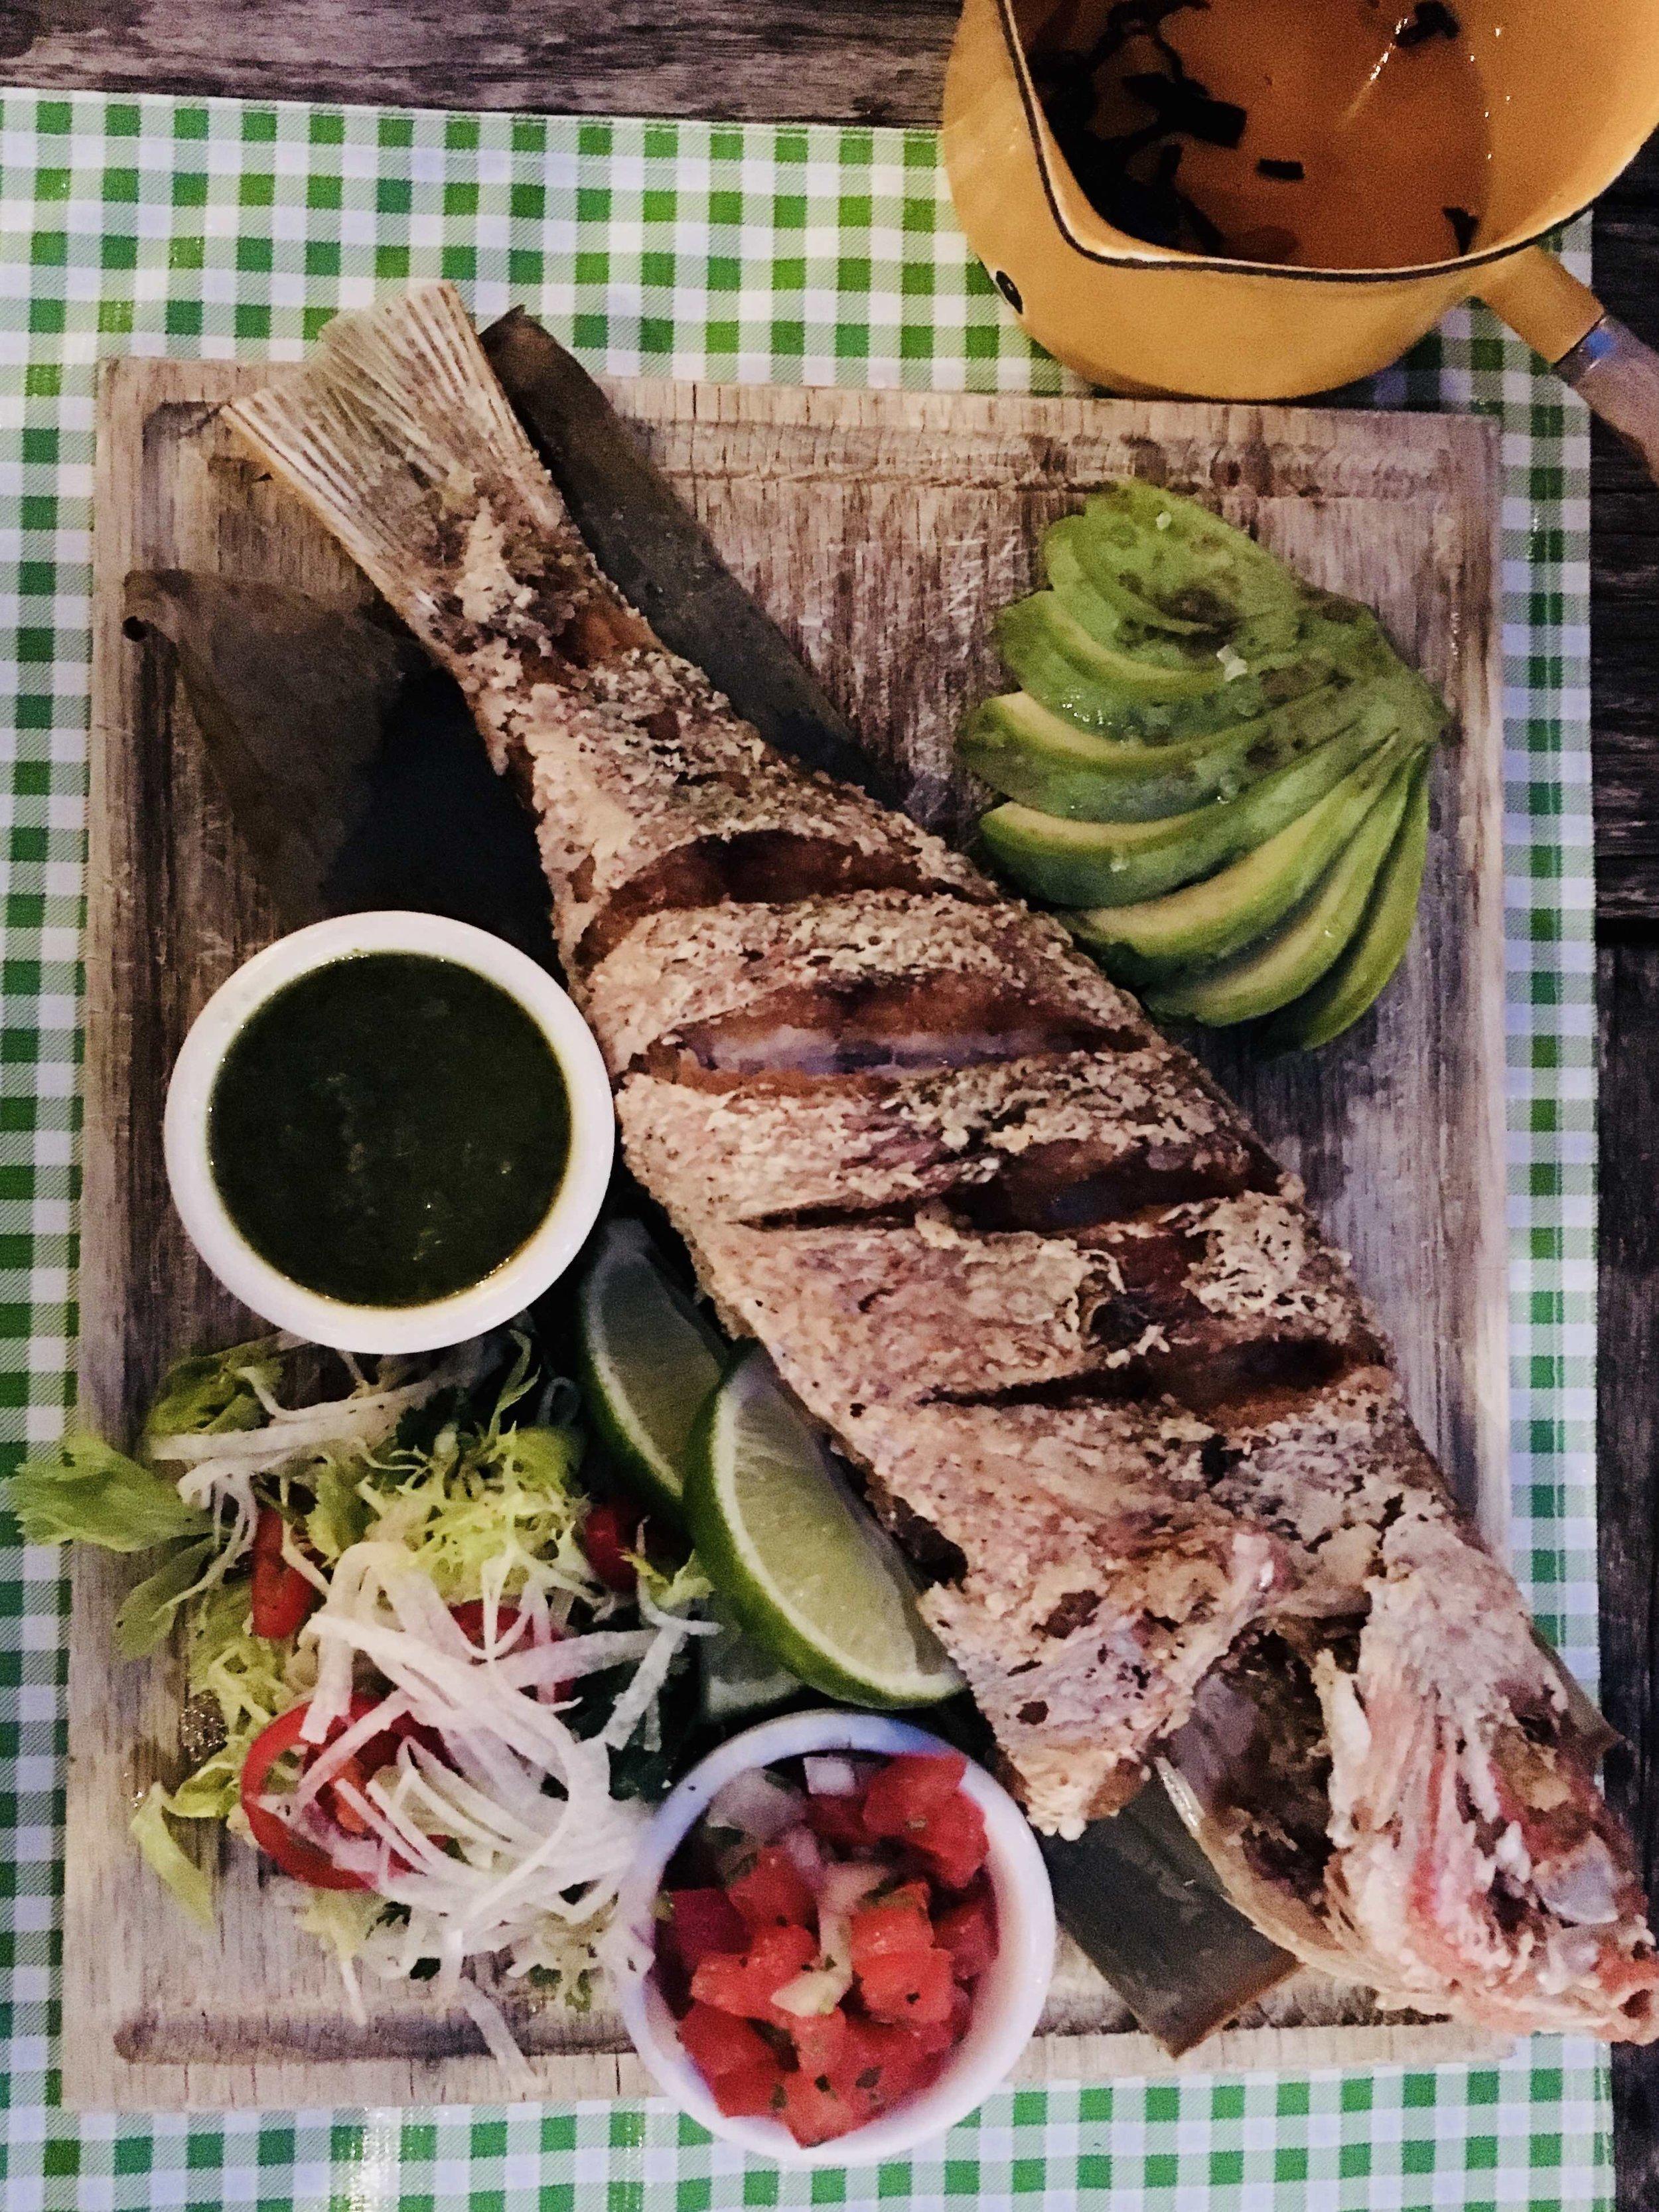 Lolos Surf Cantina Whole Fish Tacos.jpg